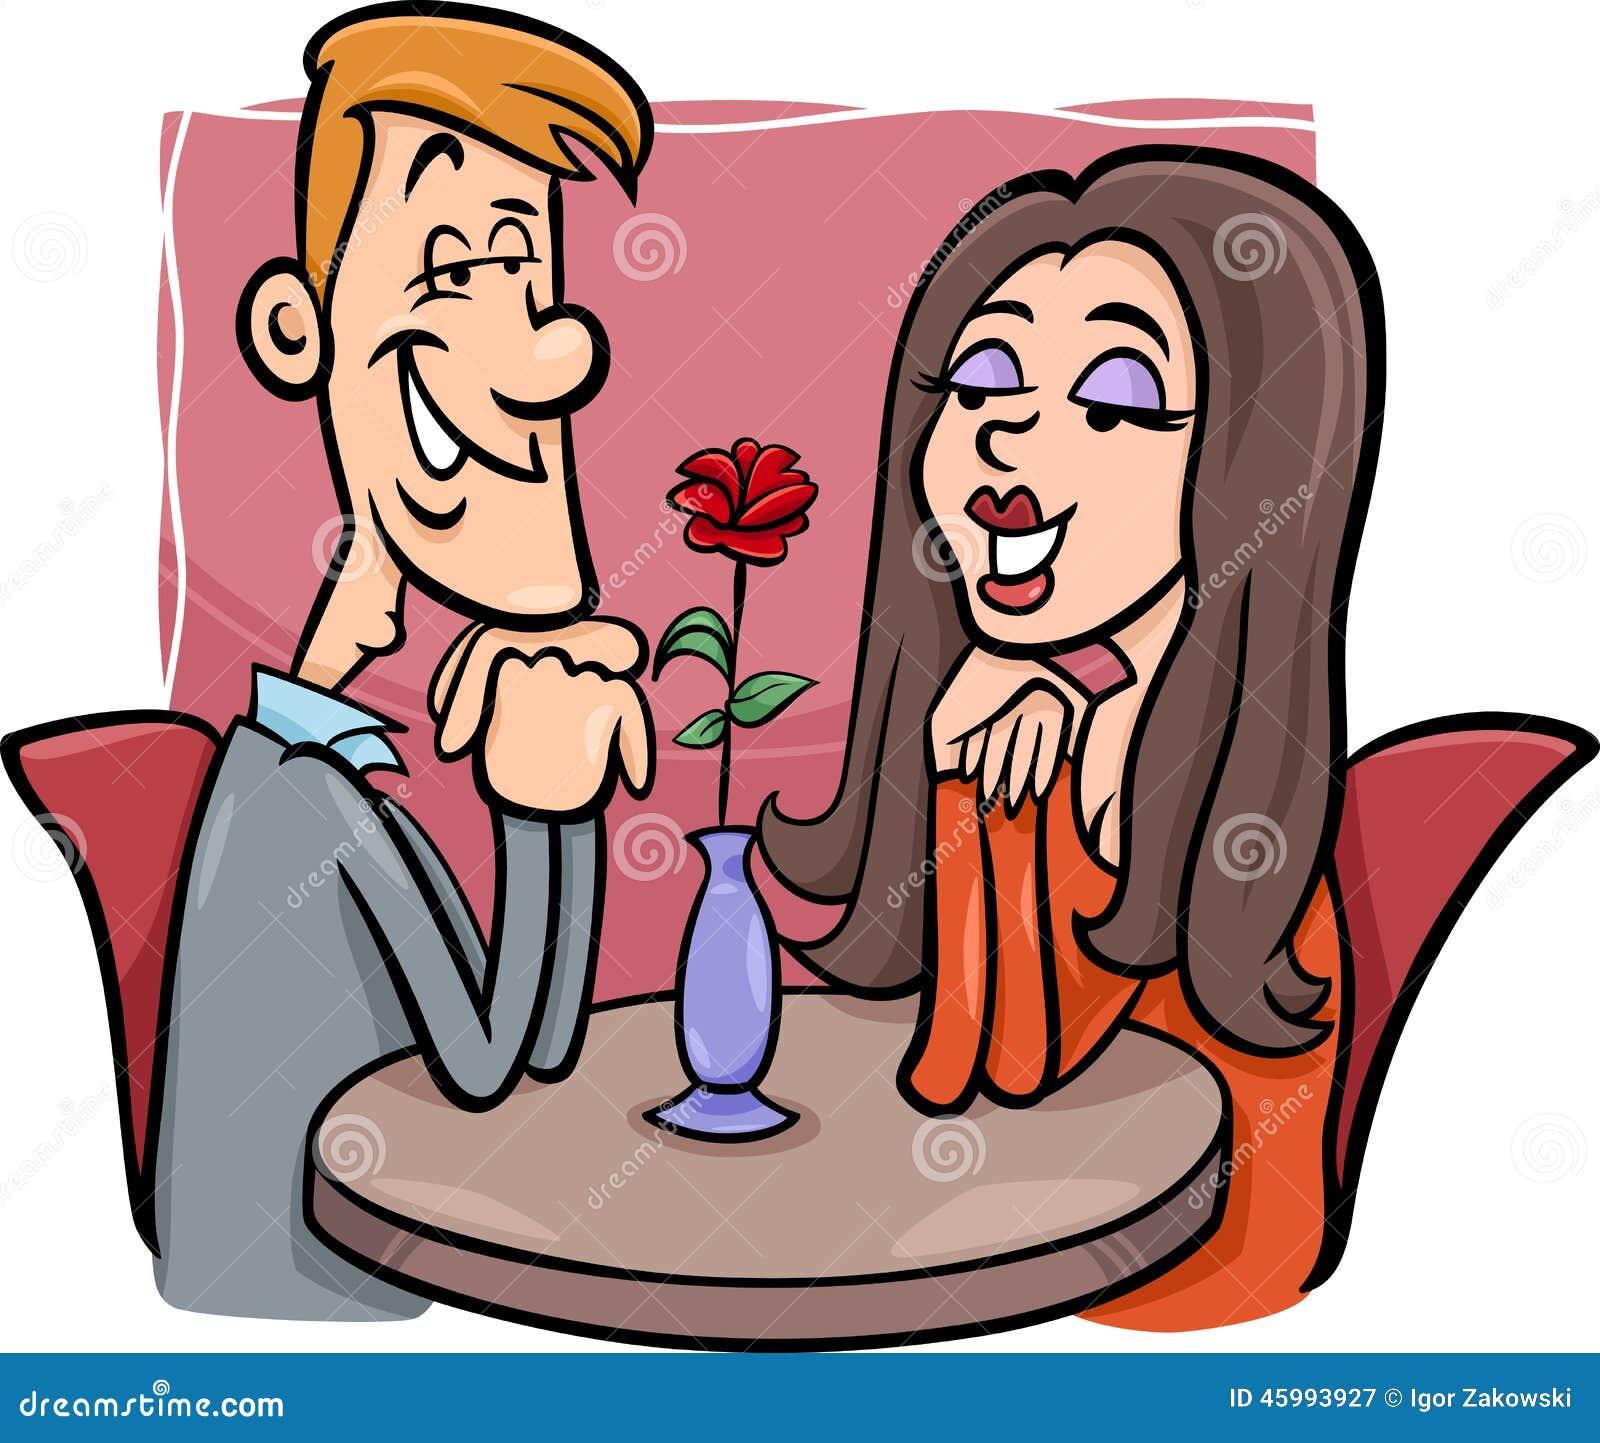 In Love Cartoon: Couple In Love Cartoon Illustration Stock Vector